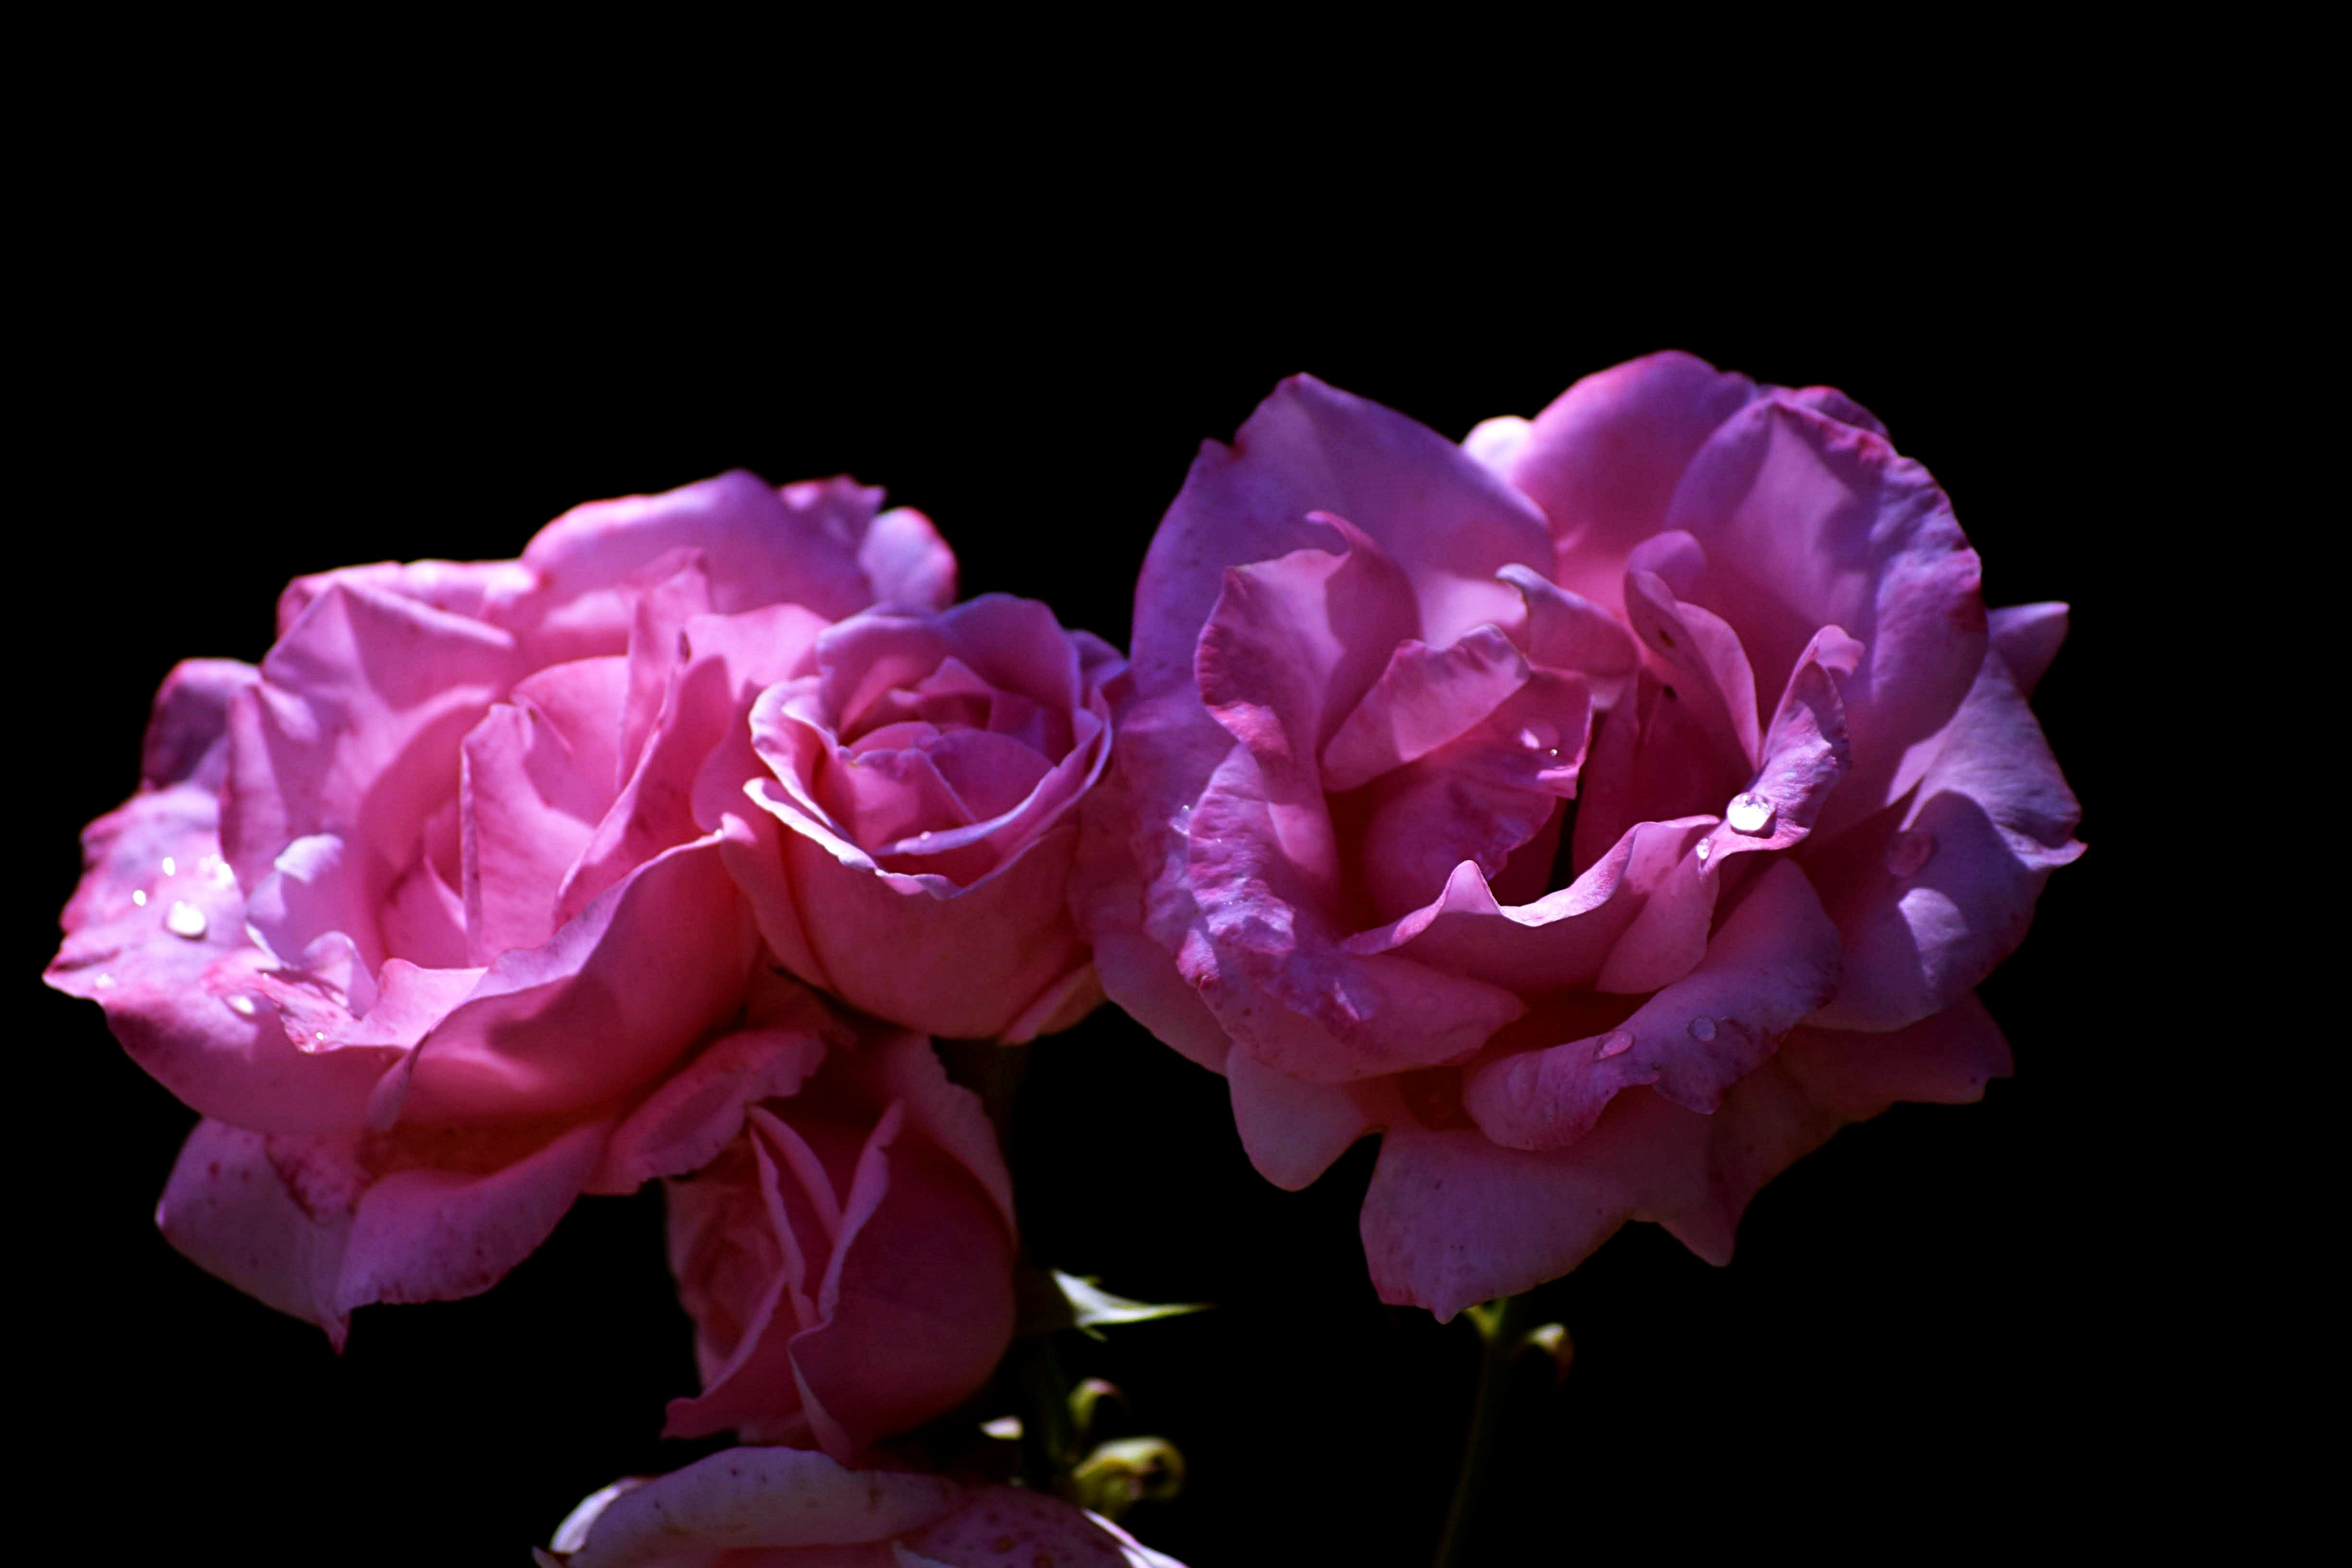 Kostenloses Stock Foto zu blumen, blütenblätter, flora, grazil